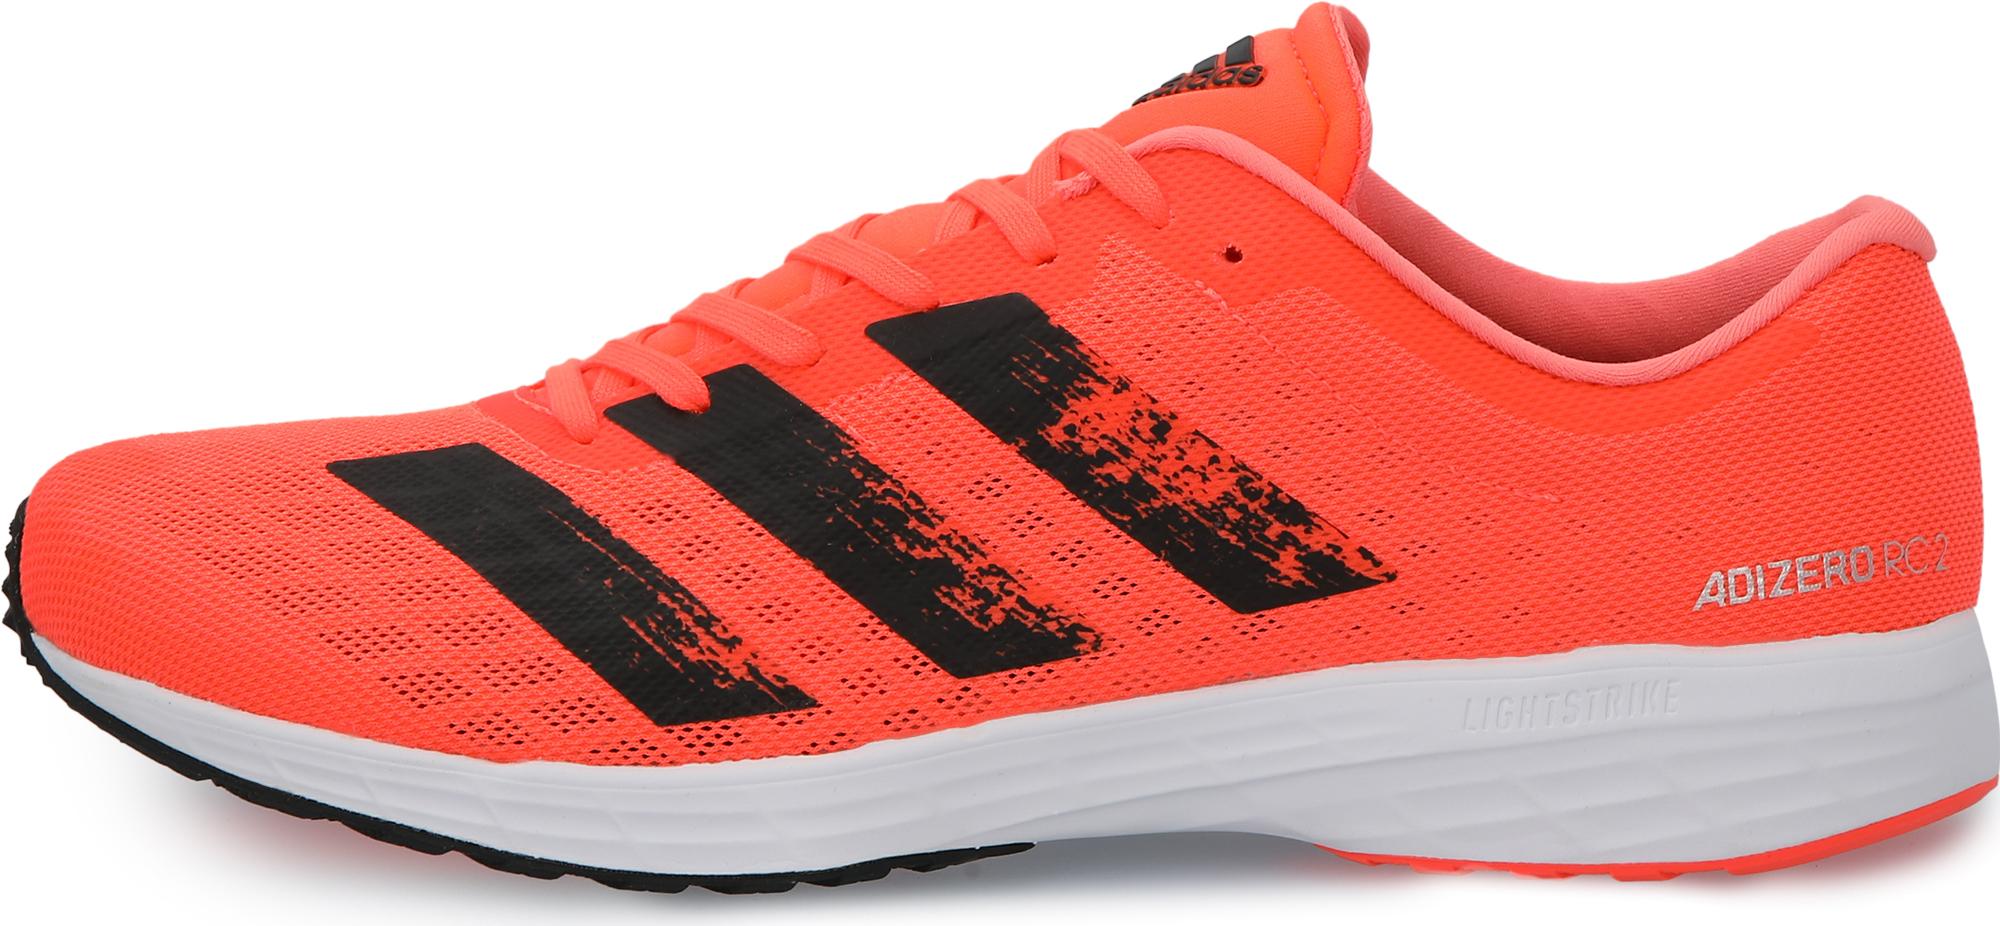 Adidas Кроссовки мужские Adidas Adizero RC 2.0, размер 42